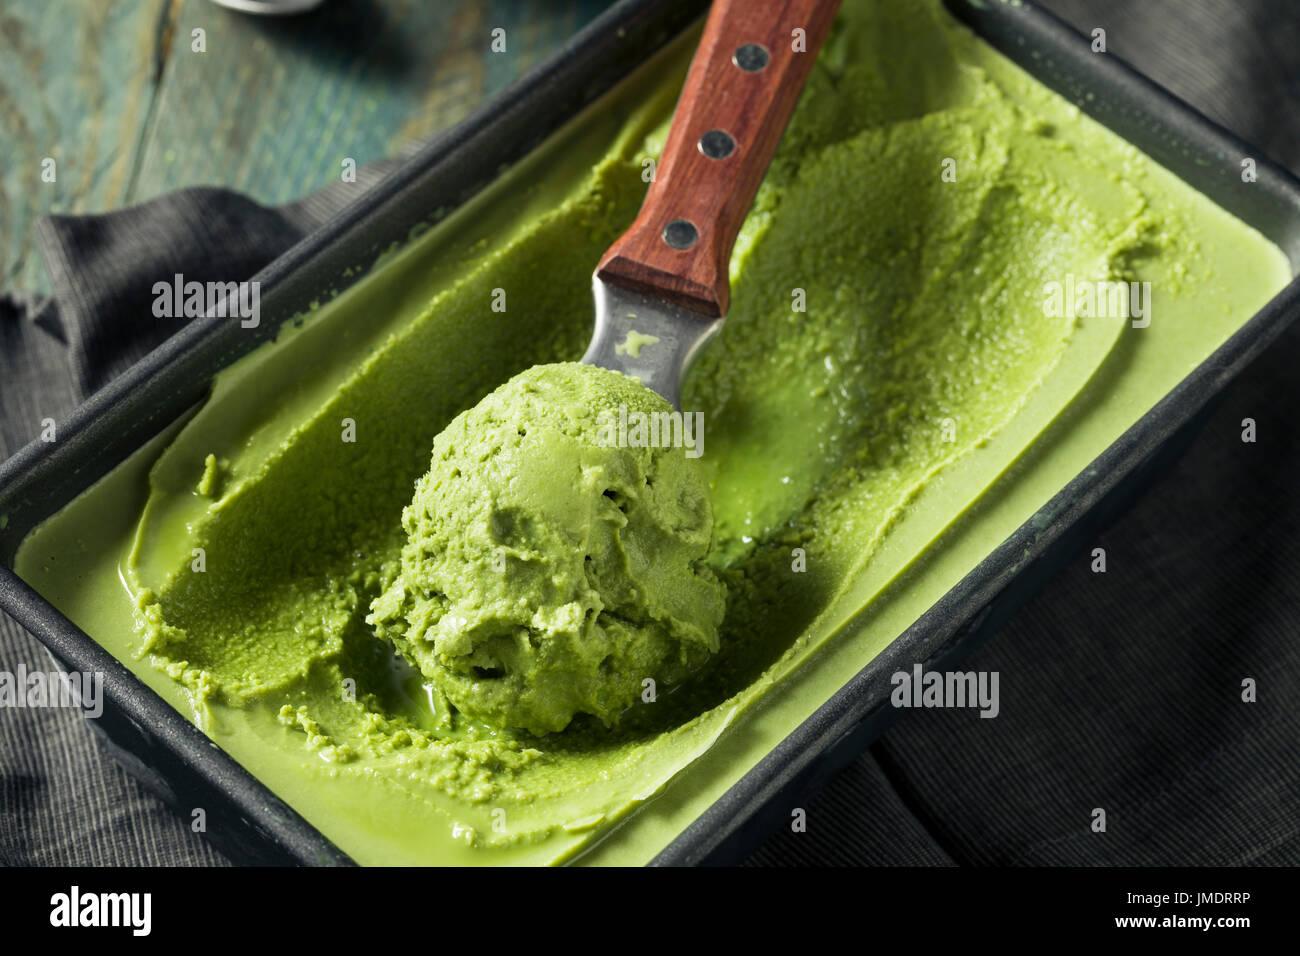 Homemade Grean Tea Matcha Ice Cream Ready to Eat - Stock Image